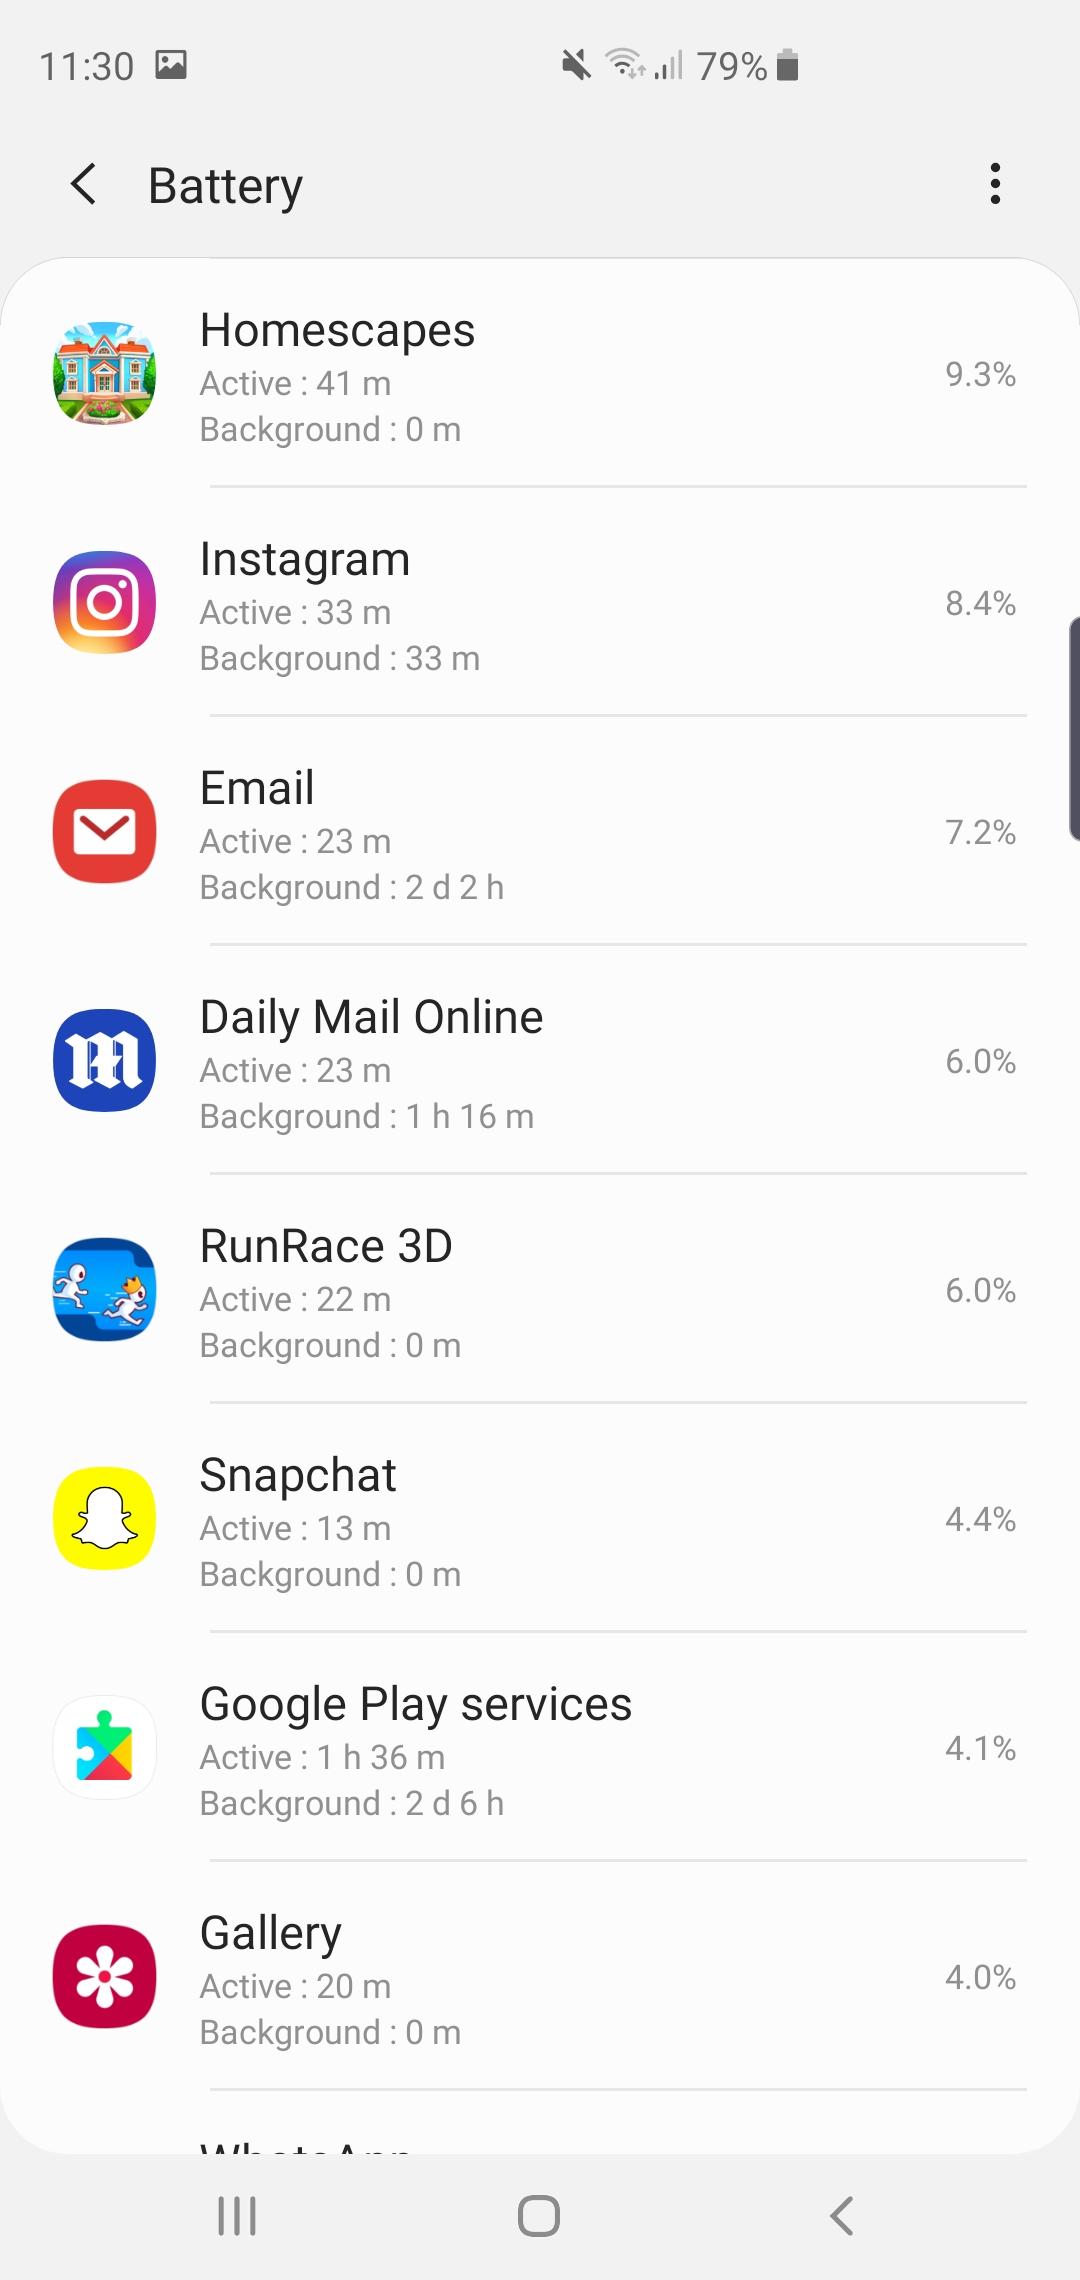 Battery - Samsung Galaxy s10 plus - Community home